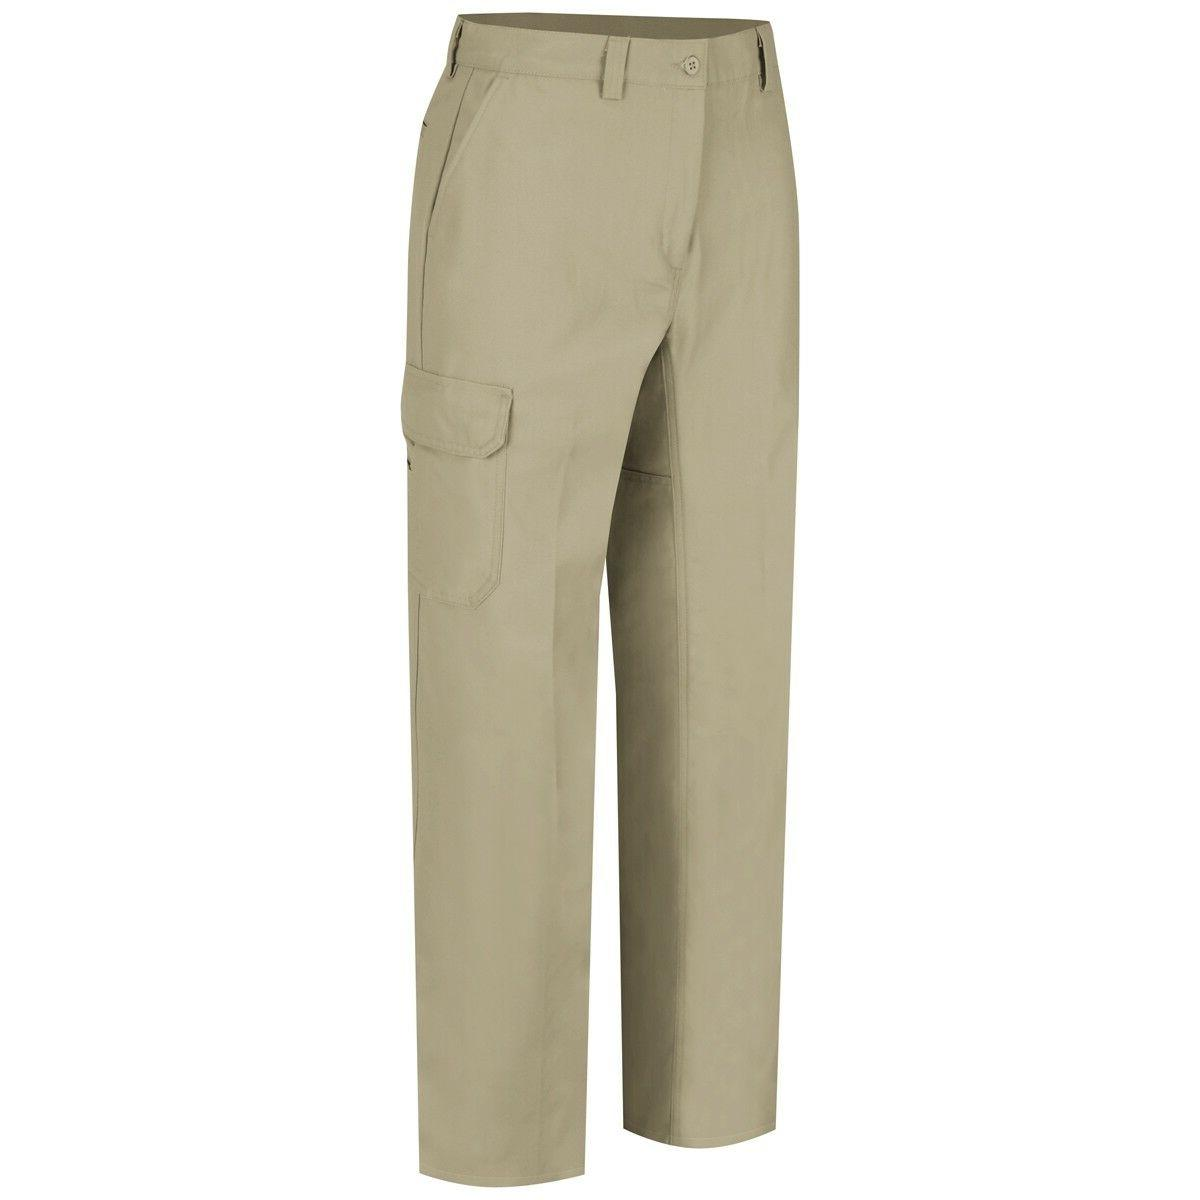 mens functional cargo work pants khaki